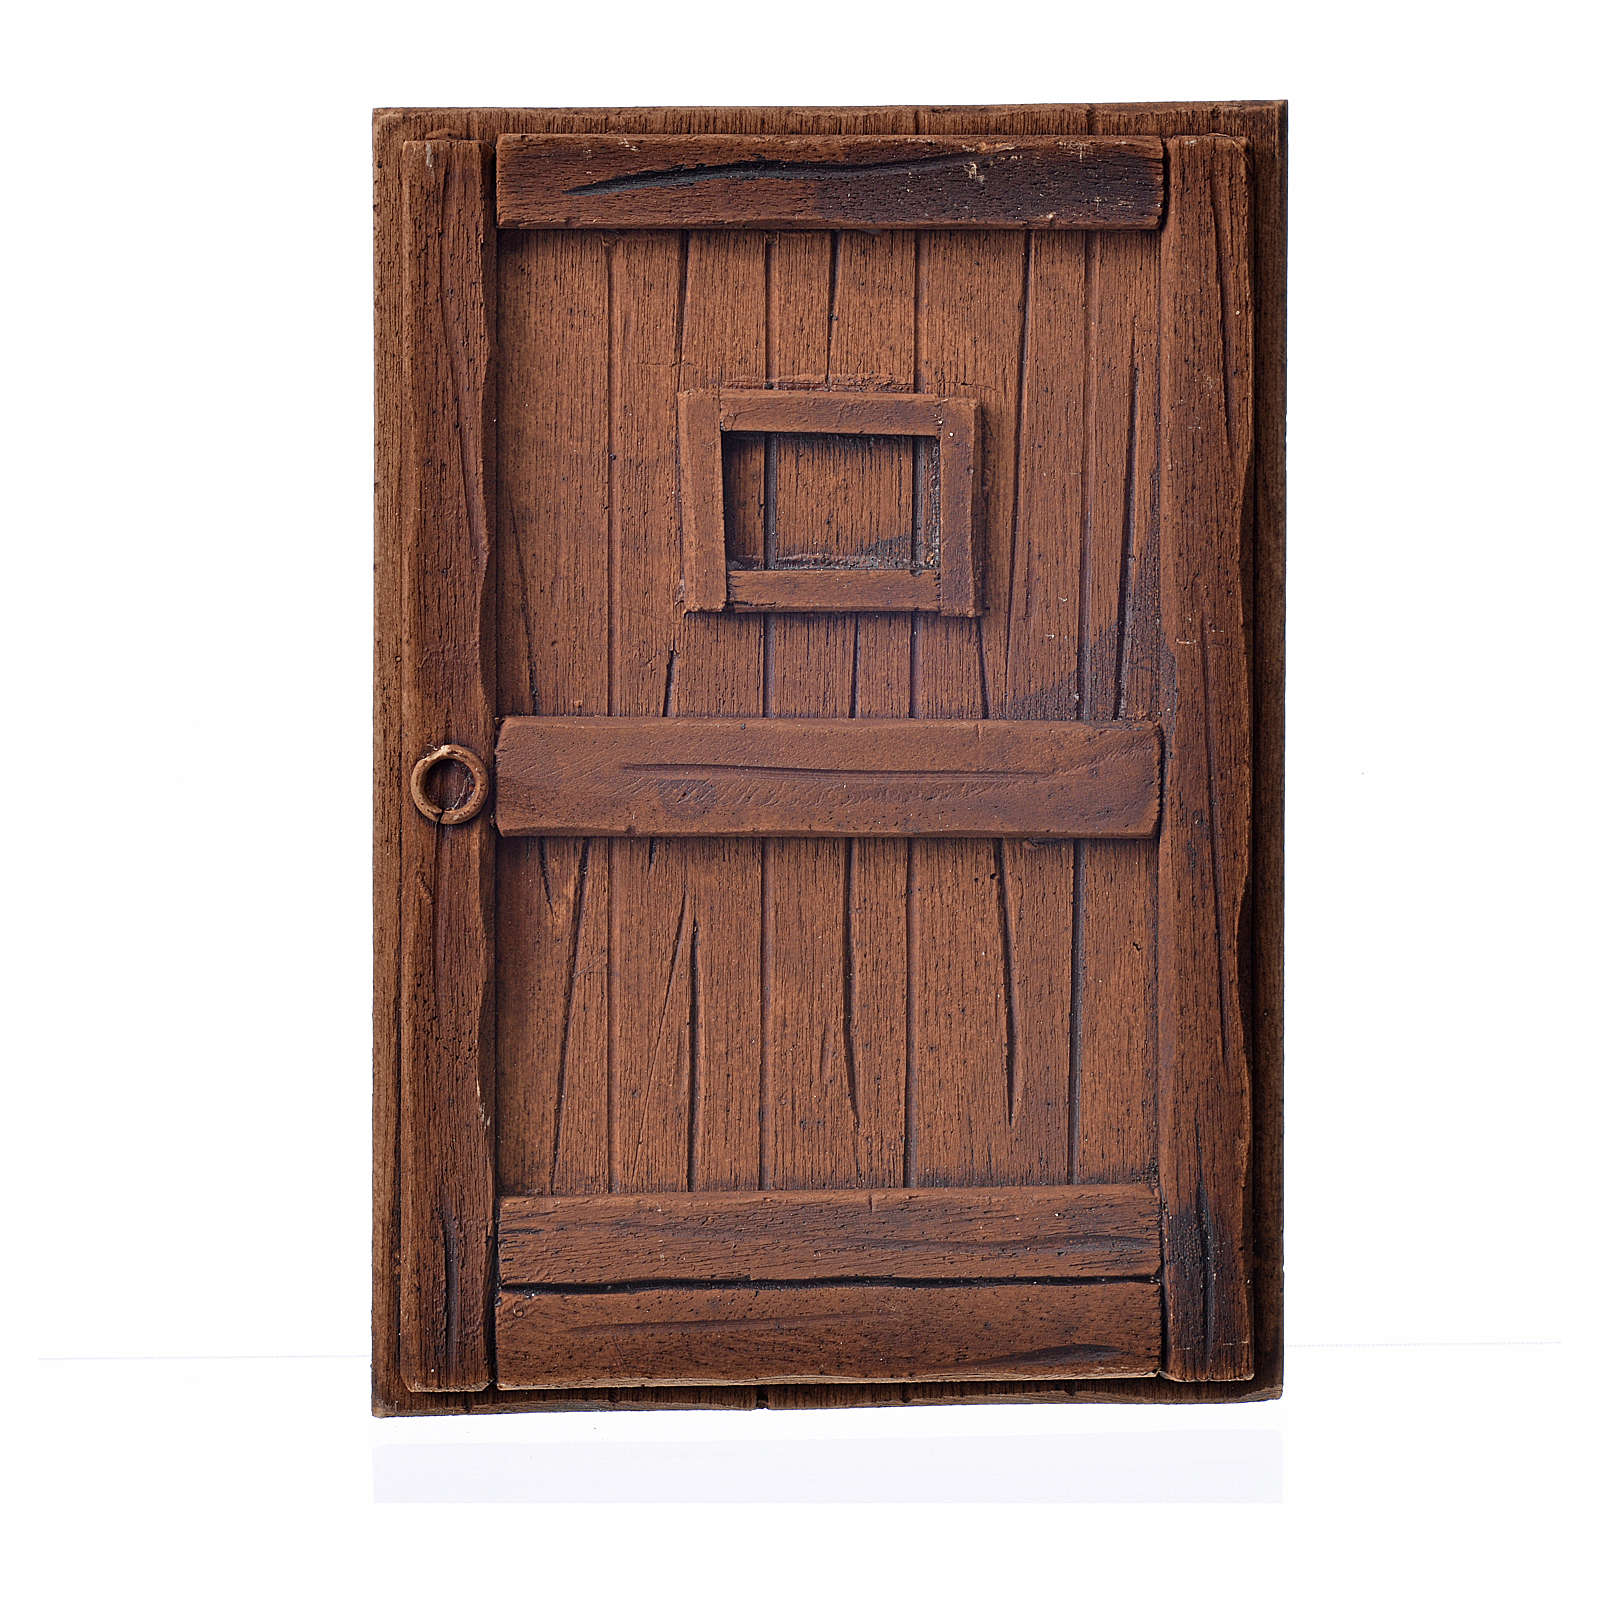 Nativity accessory, plaster door, dark wood colour,10x7cm 4